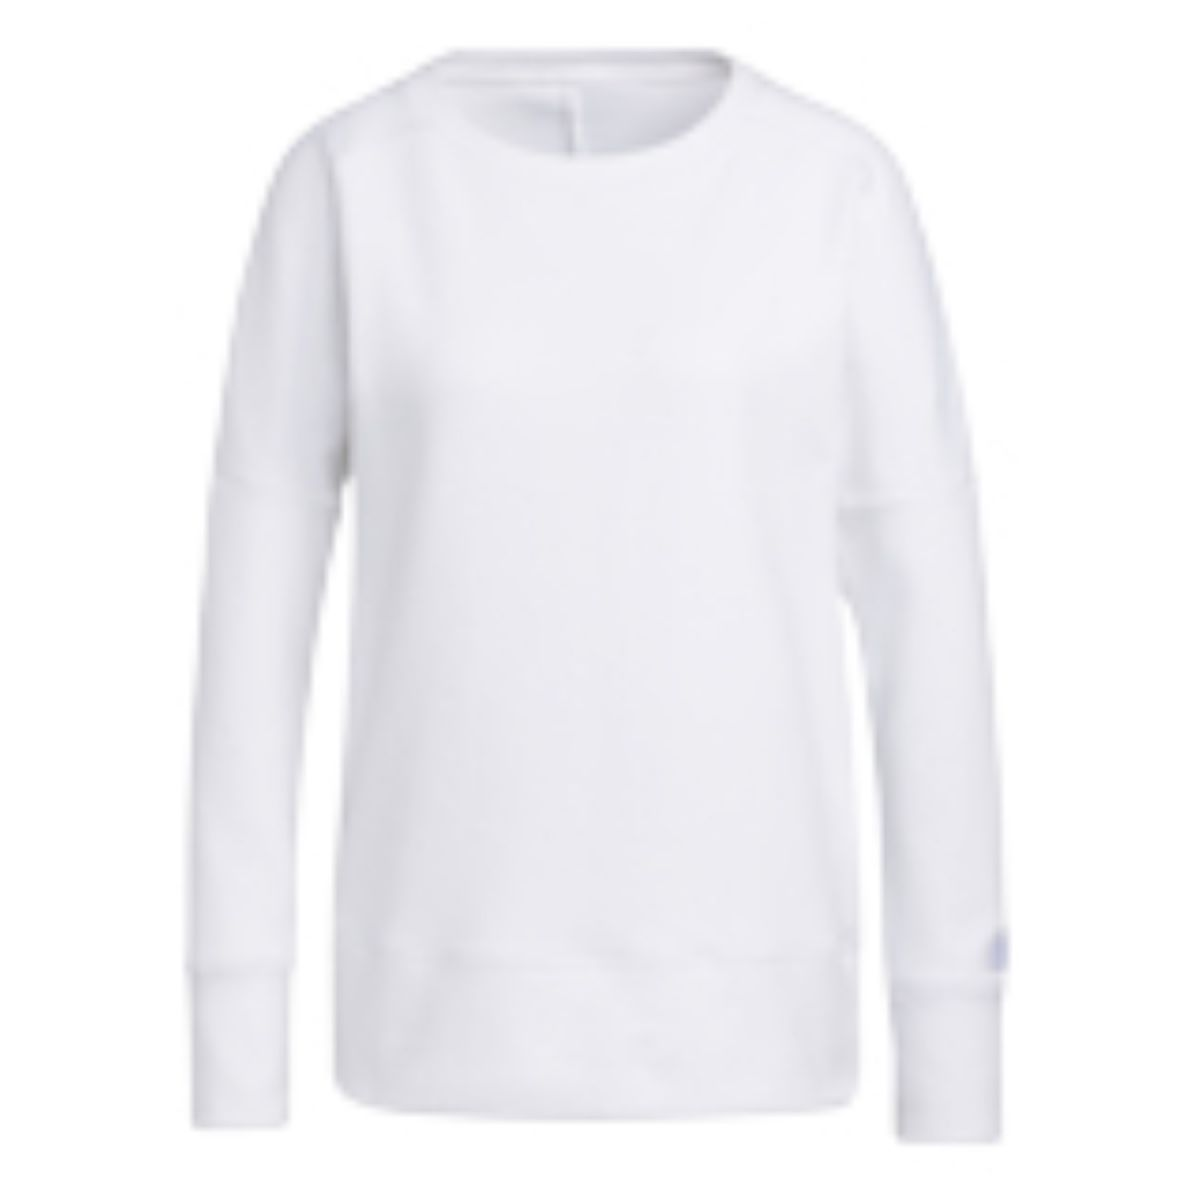 adidas w sweater goto sweatshirt crew white s